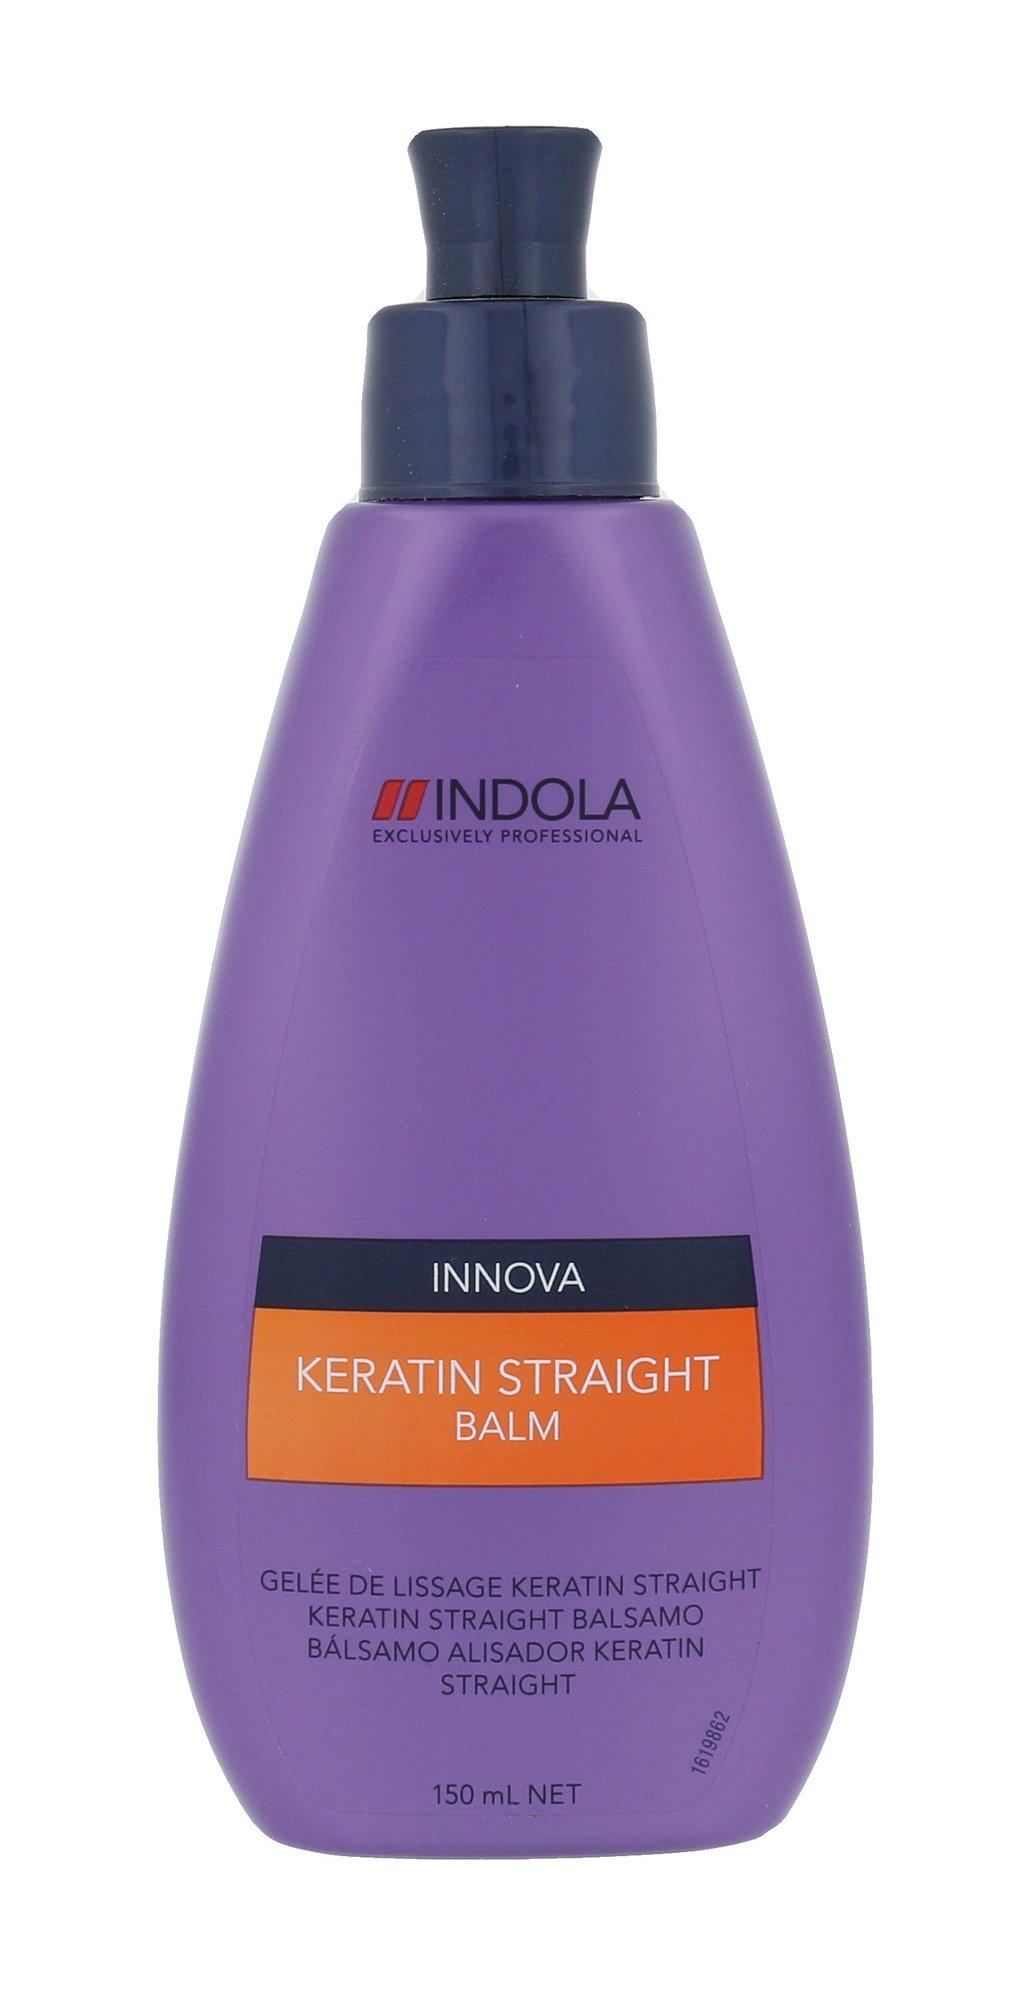 Indola Innova Keratin Straight Balm Cosmetic 150ml